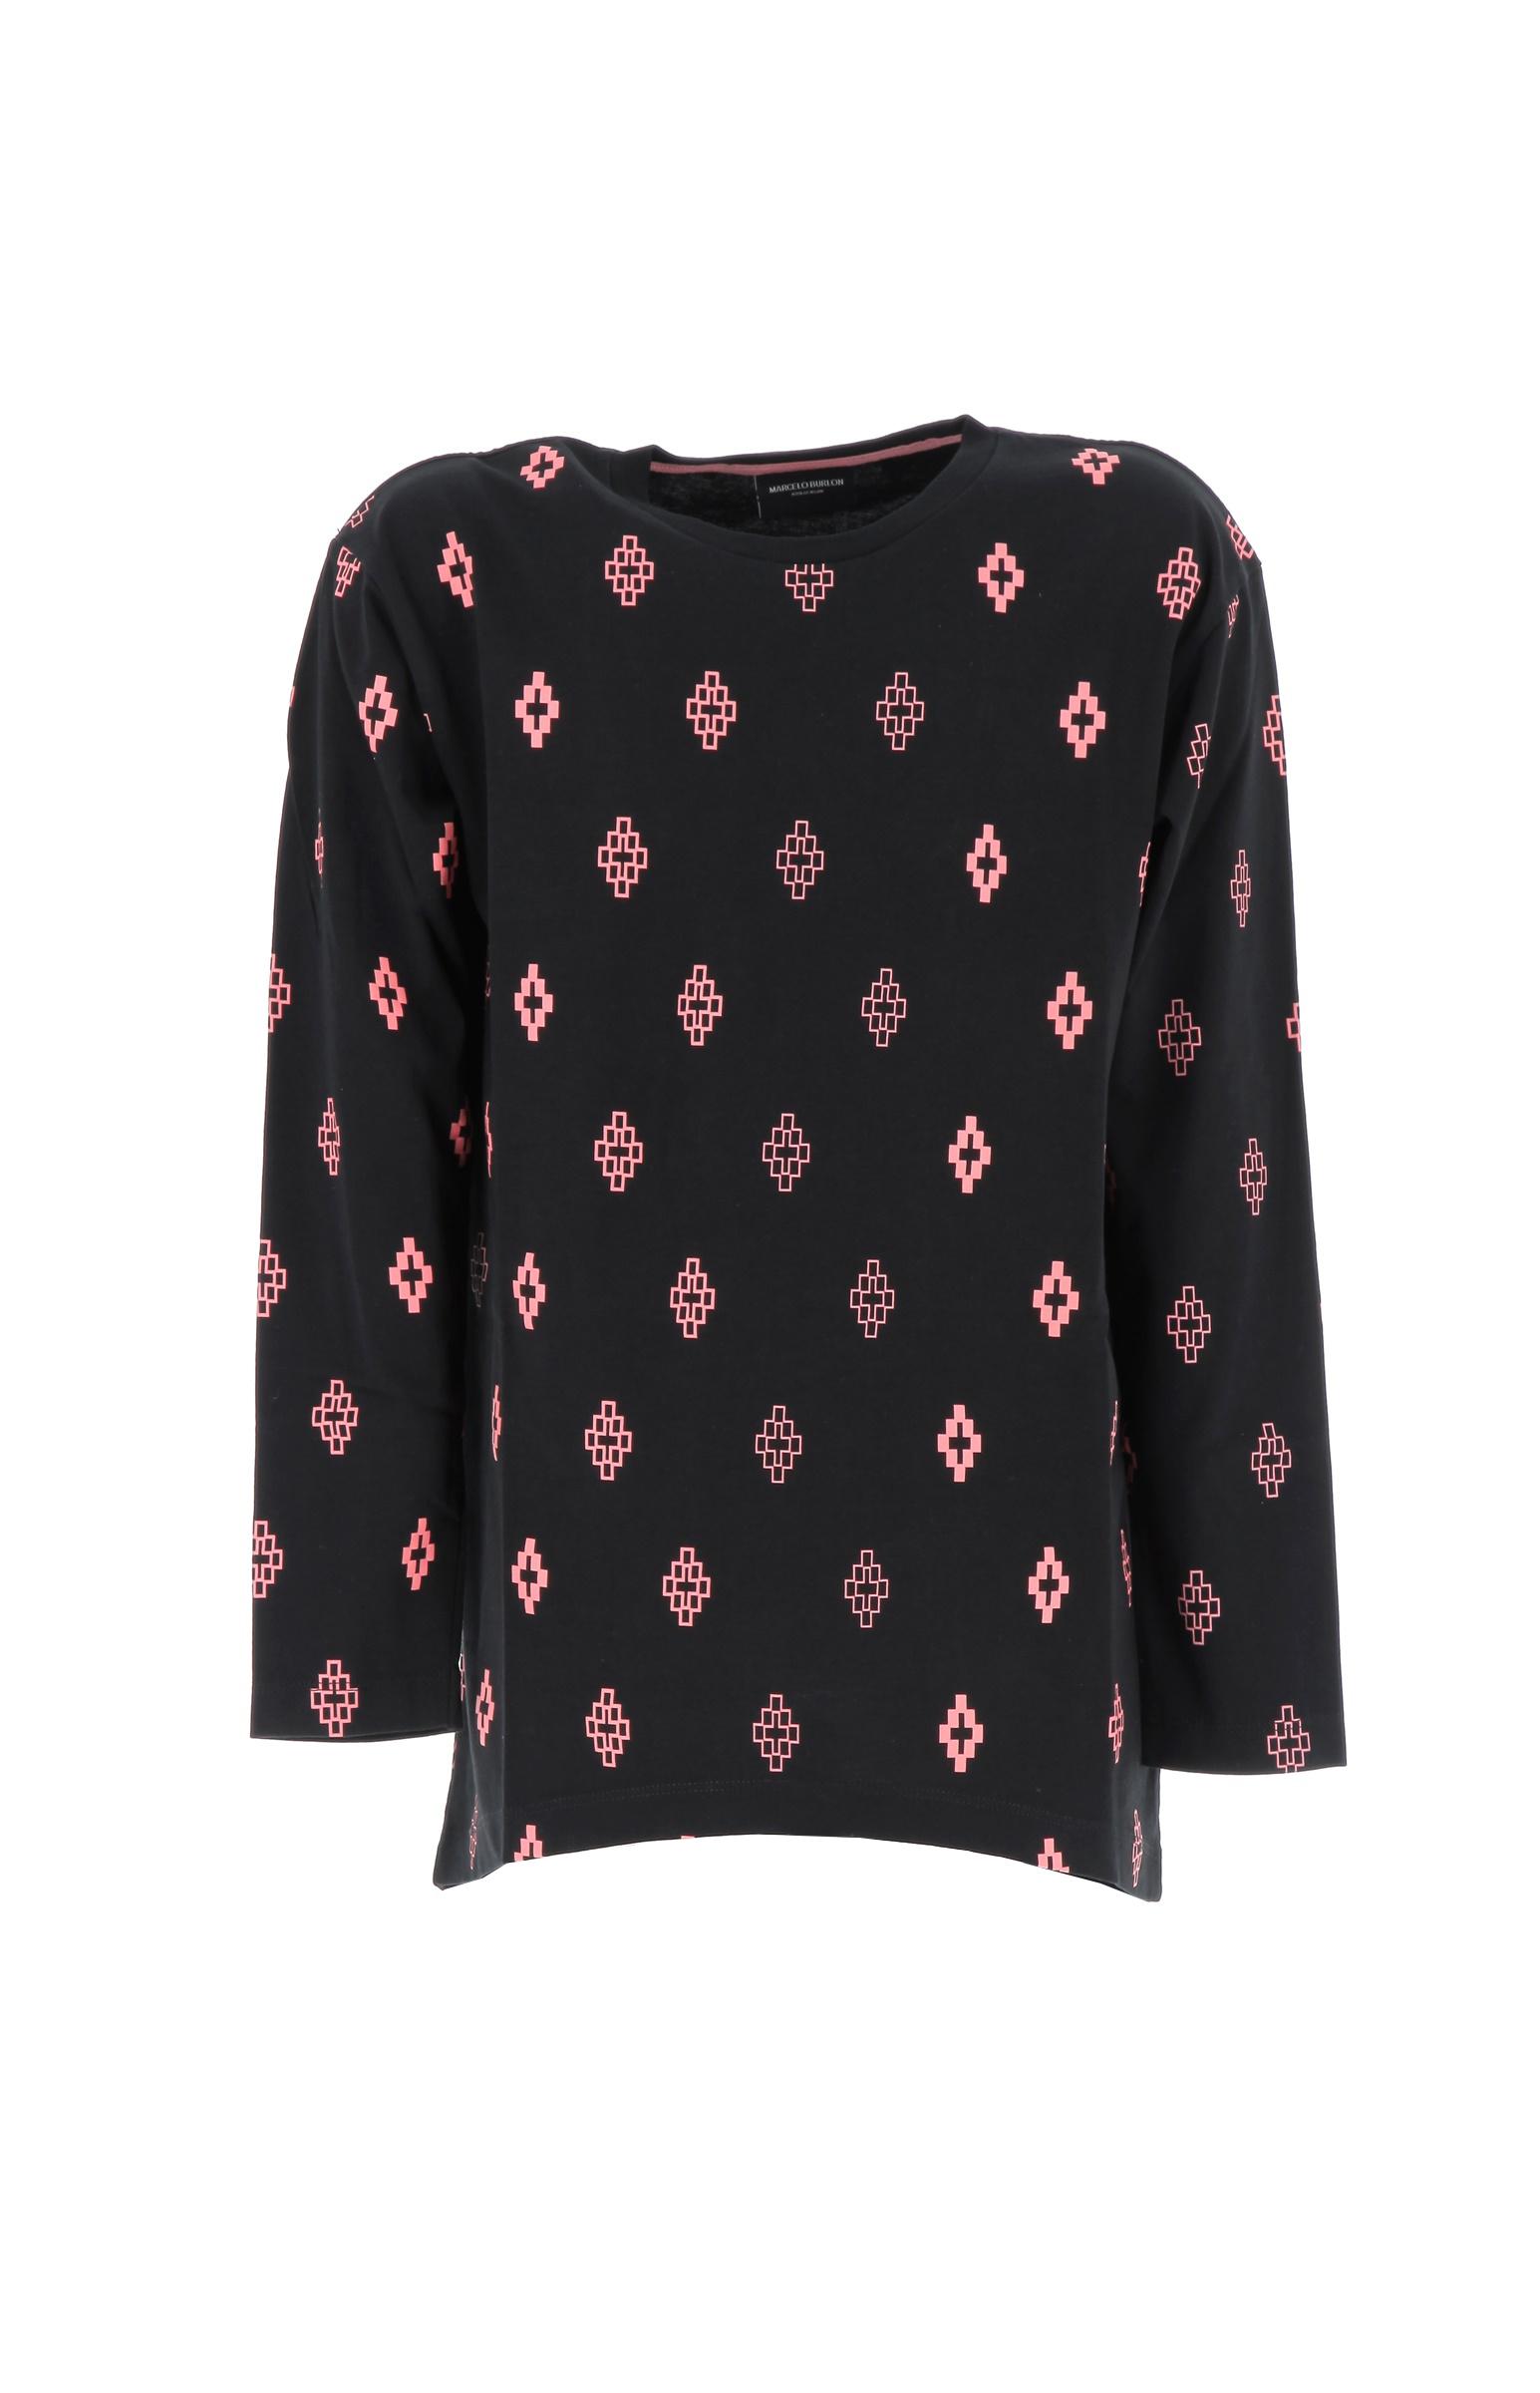 marcelo burlon t-shirt girl MARCELO BURLON KIDS OF MILAN | T-shirt | BMB10020010INVB010